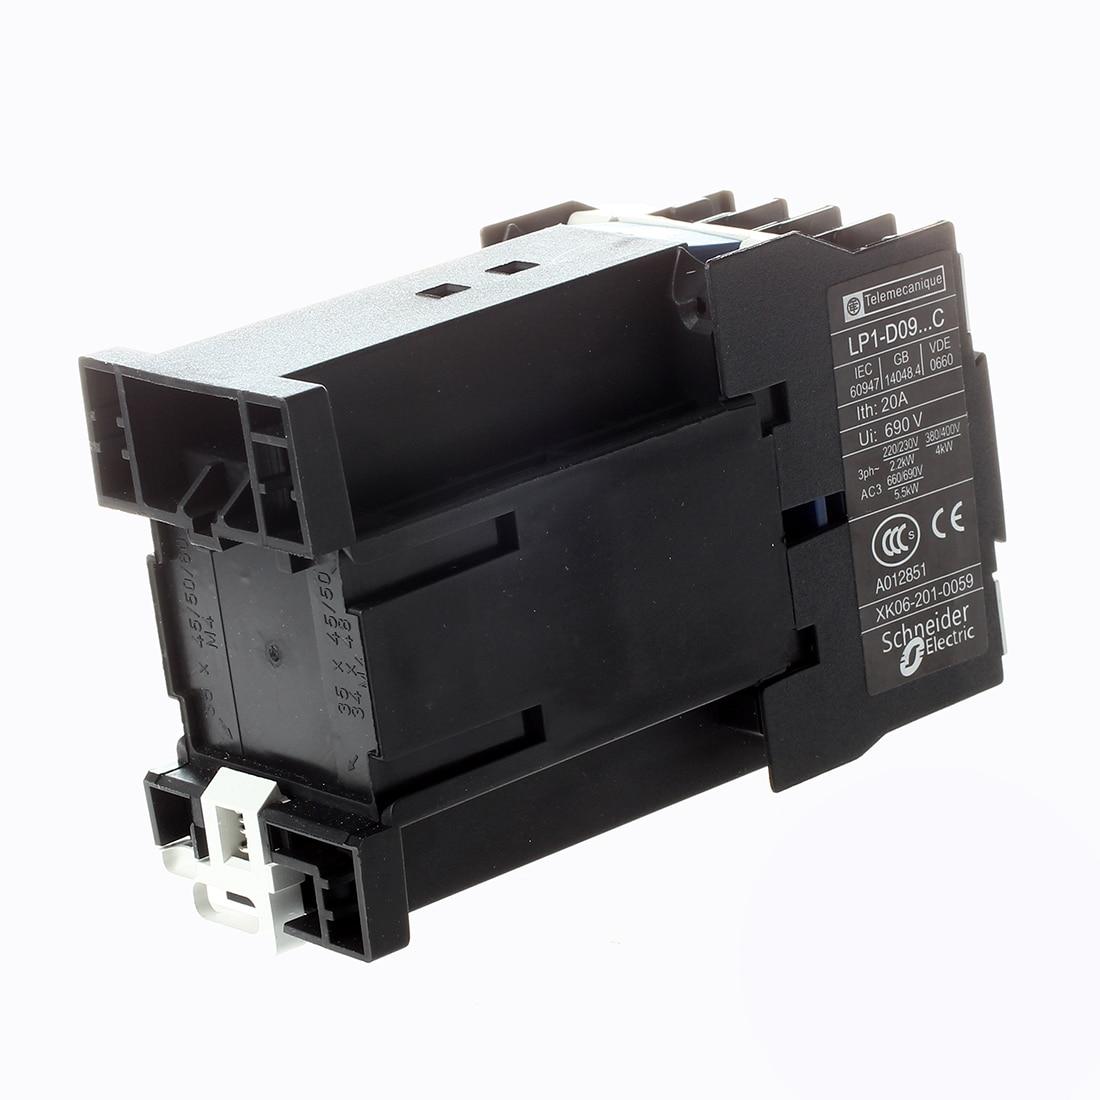 LP1-D09 Contactor 24V DC Coil, IN STOCK стоимость